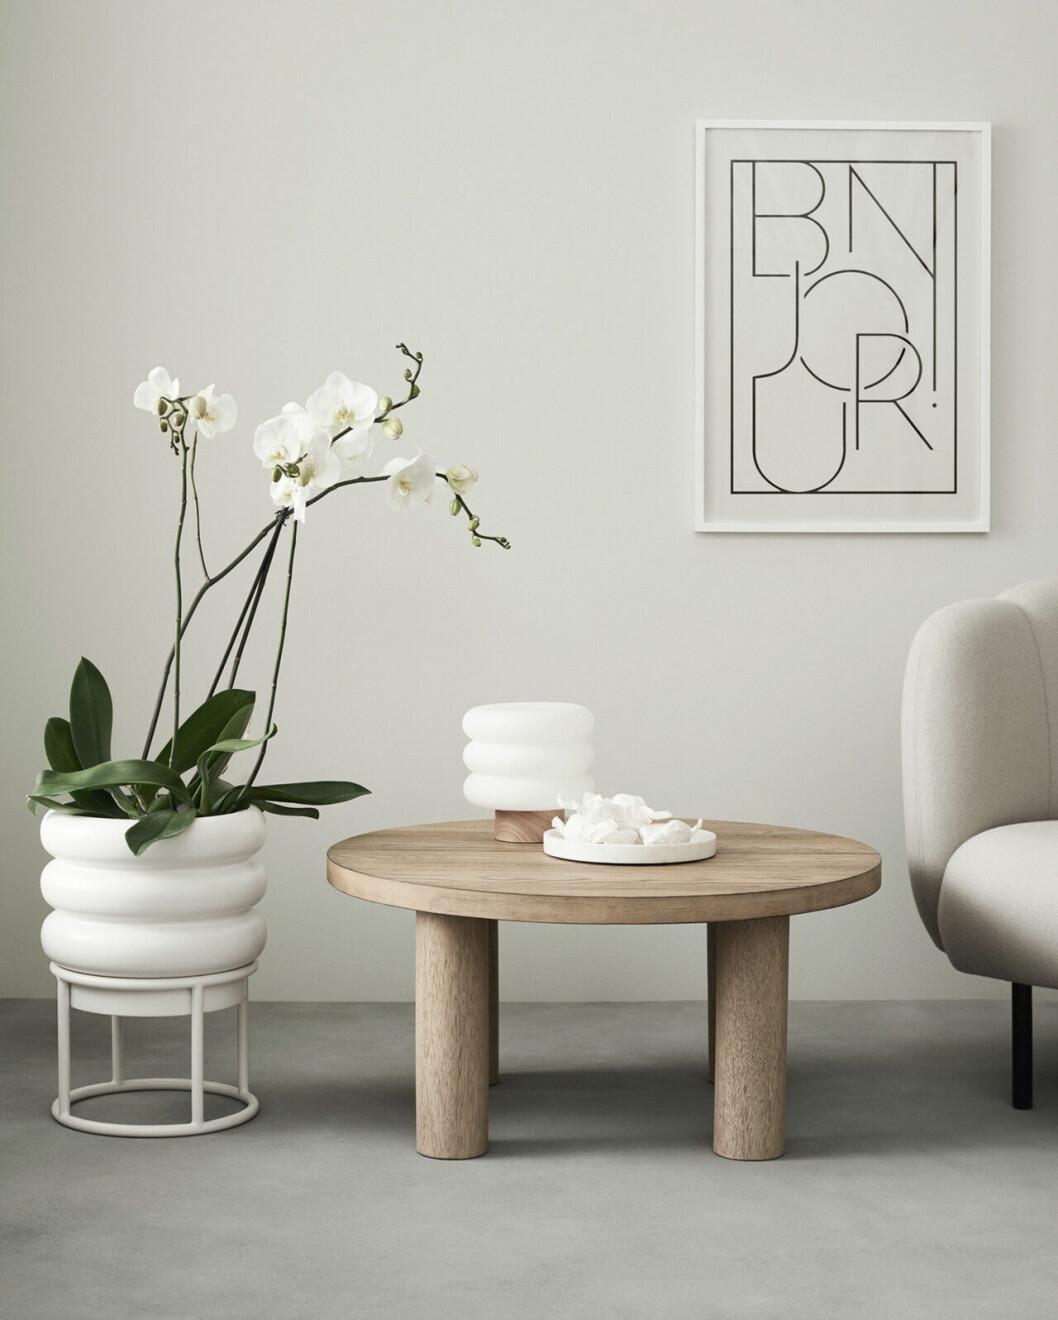 Soffbord i trä från H&M Home